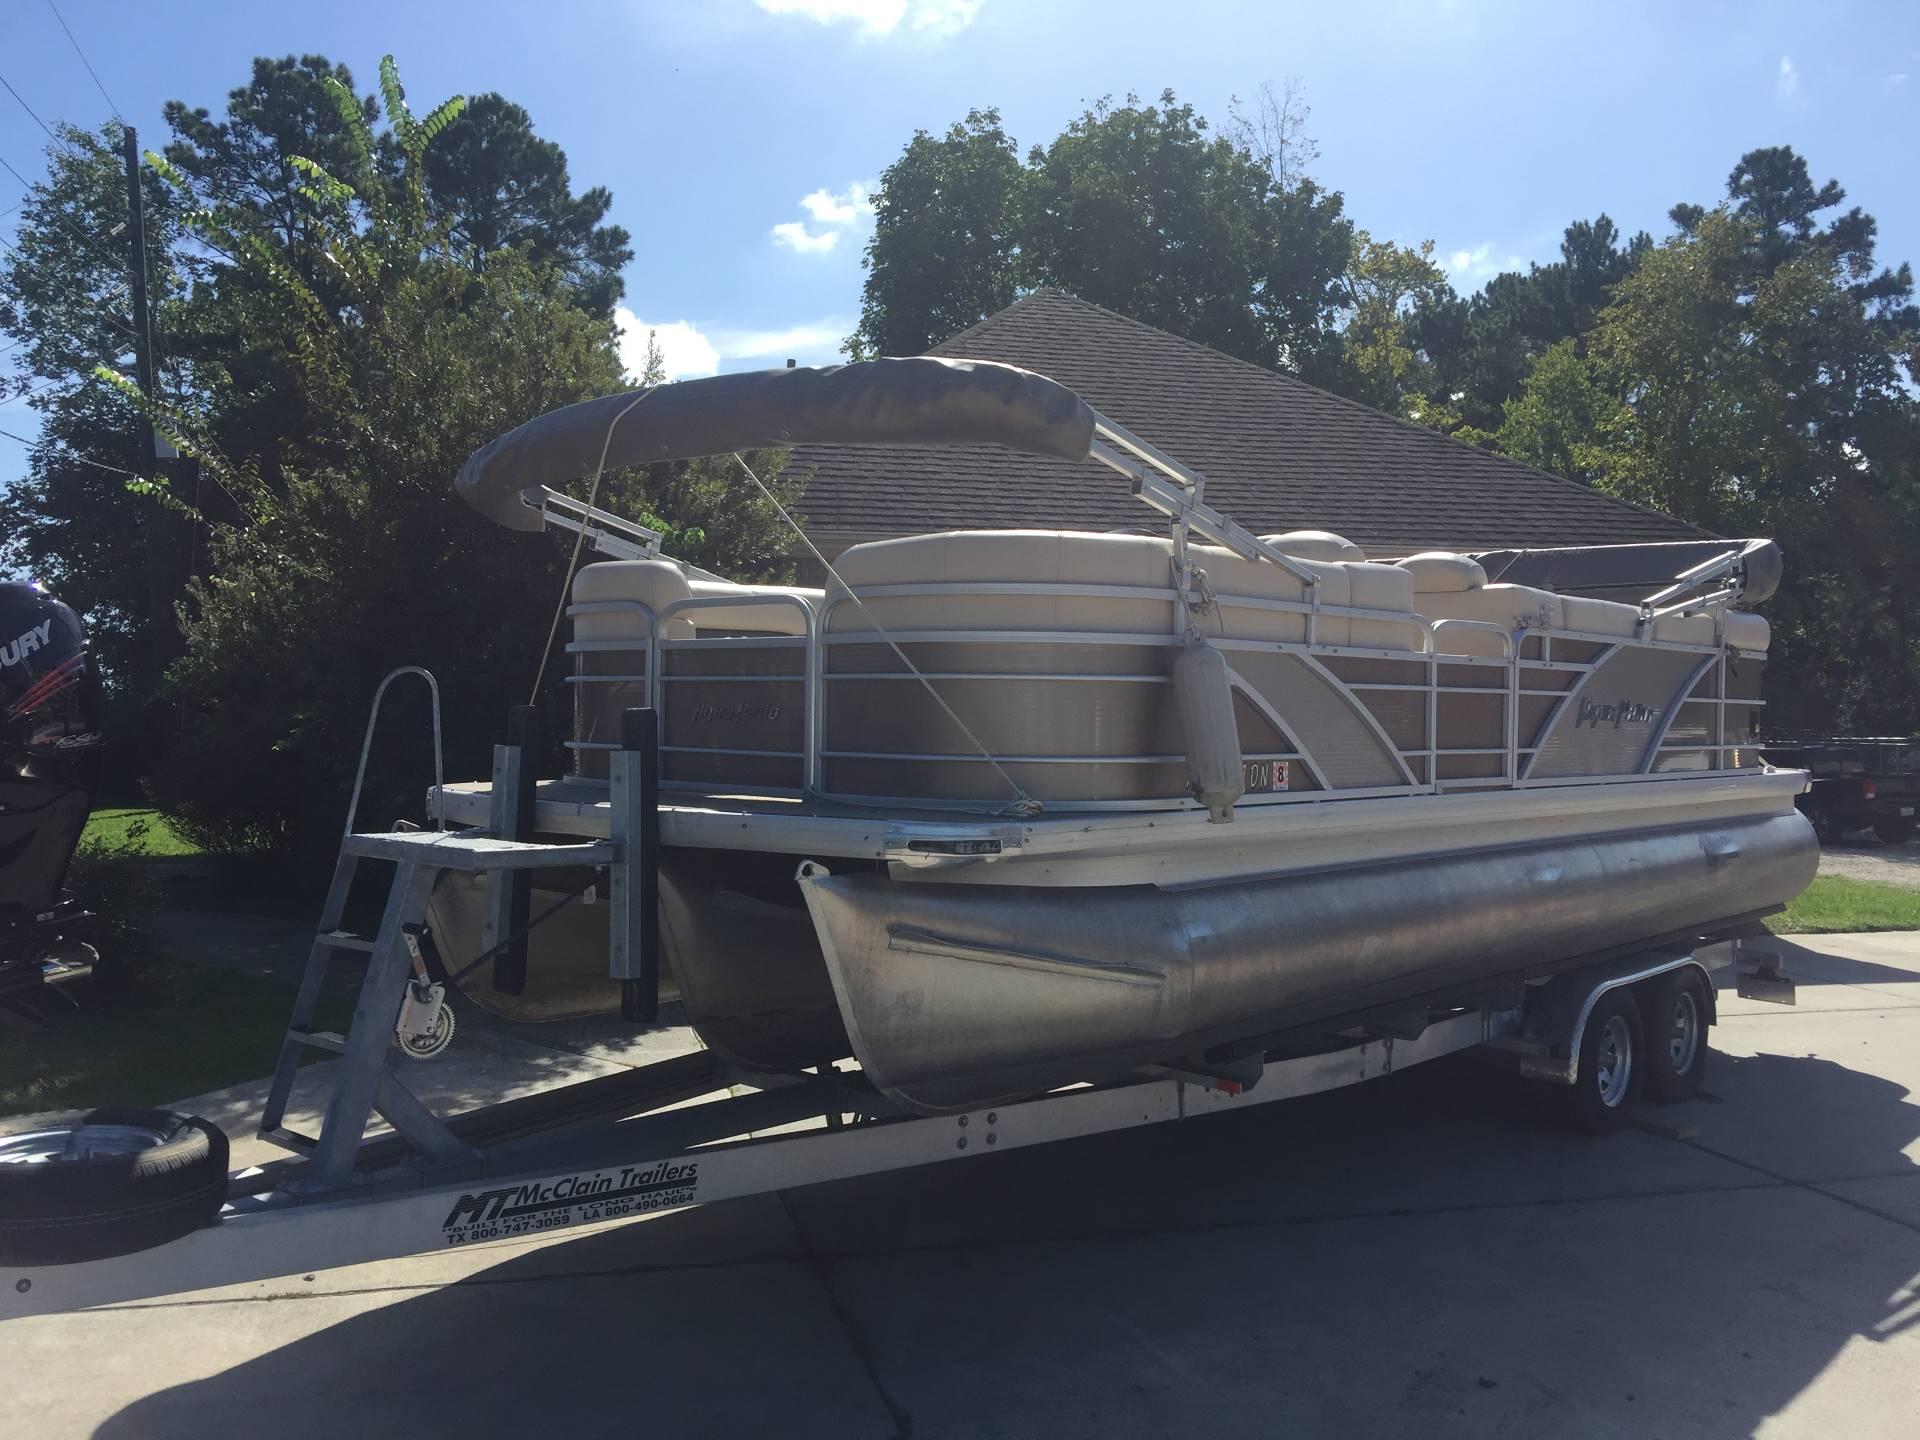 2015 Aqua Patio AP 240 Elite Kingsland Texas boats